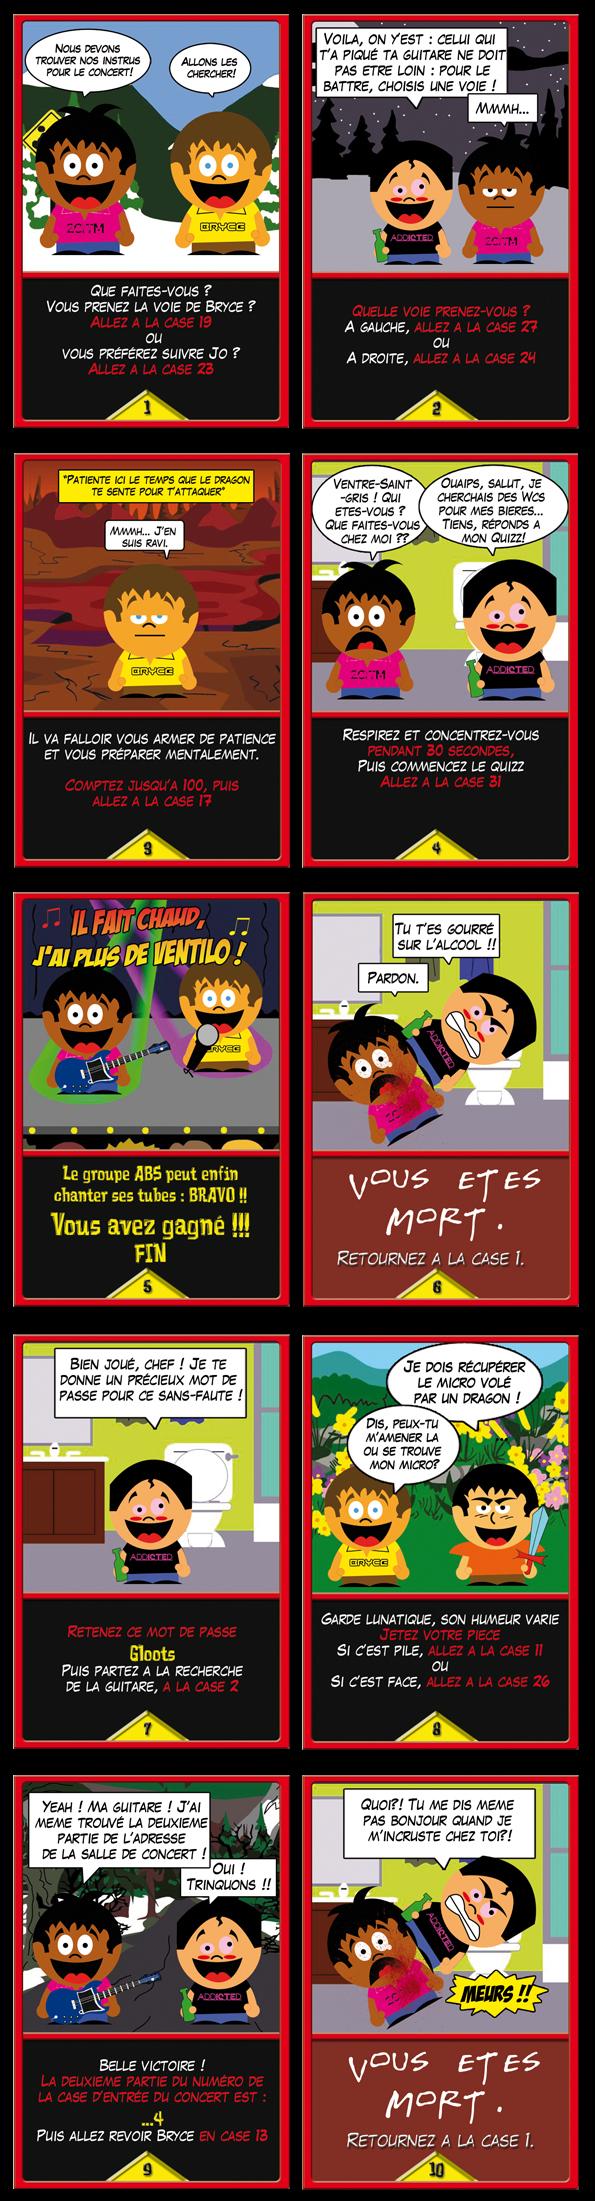 http://kamathaz.free.fr/jolindien/LivreJeu01.jpg